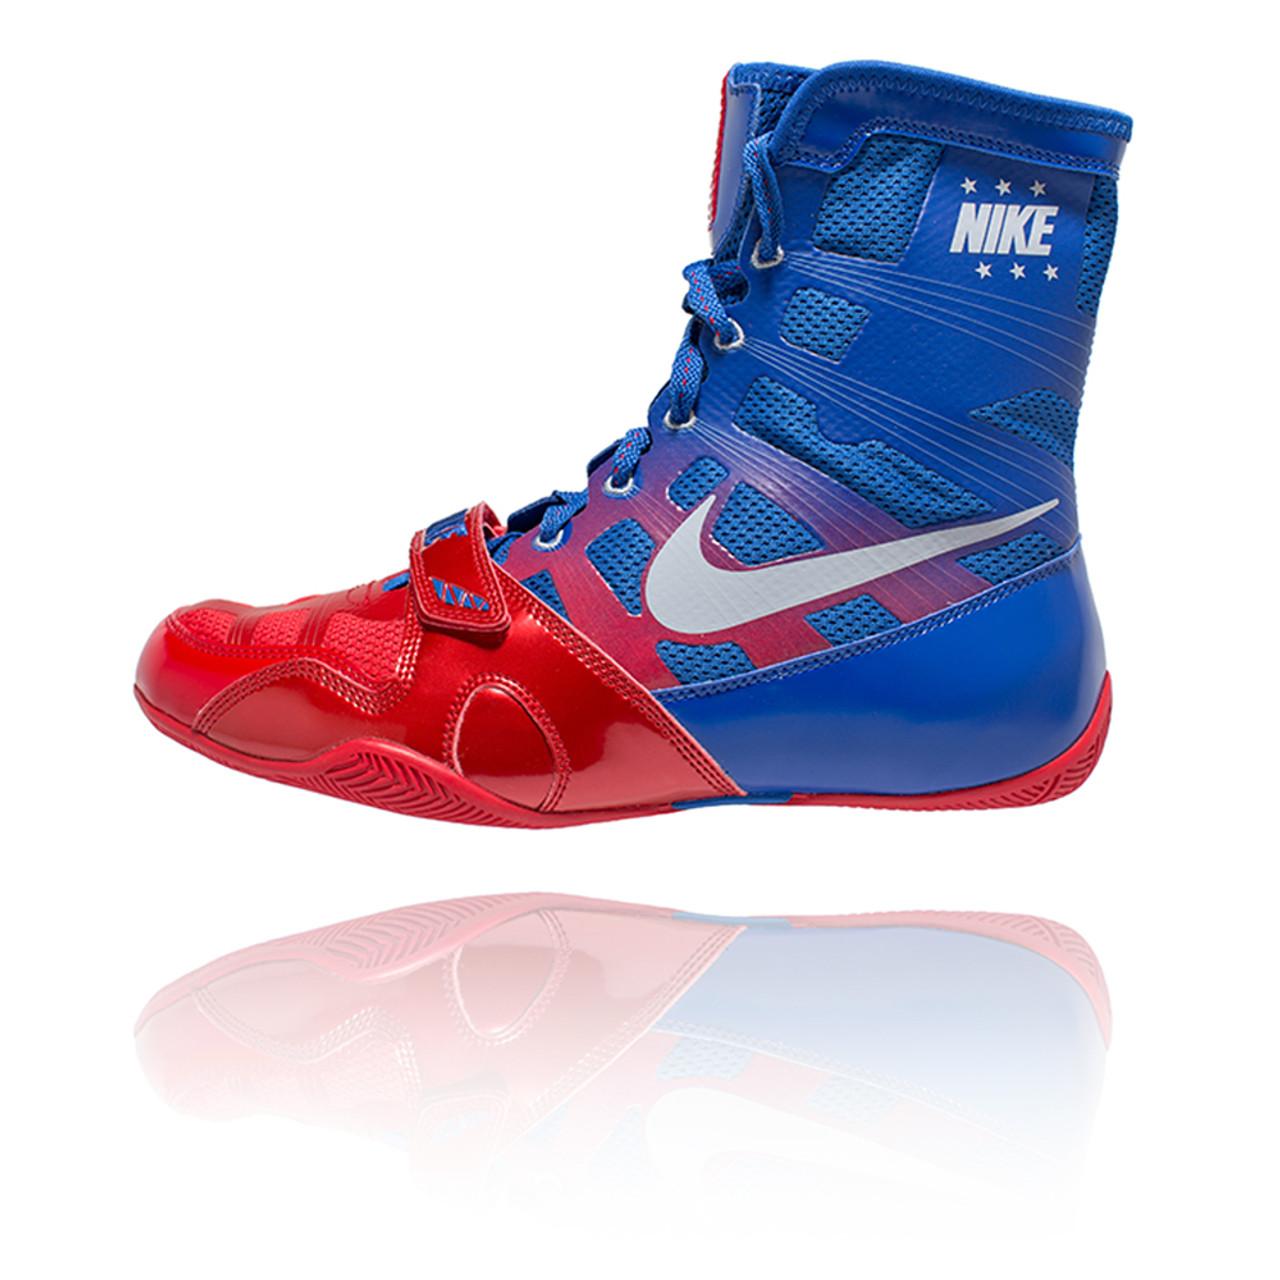 Nike HyperKO - Sport Red/Metallic